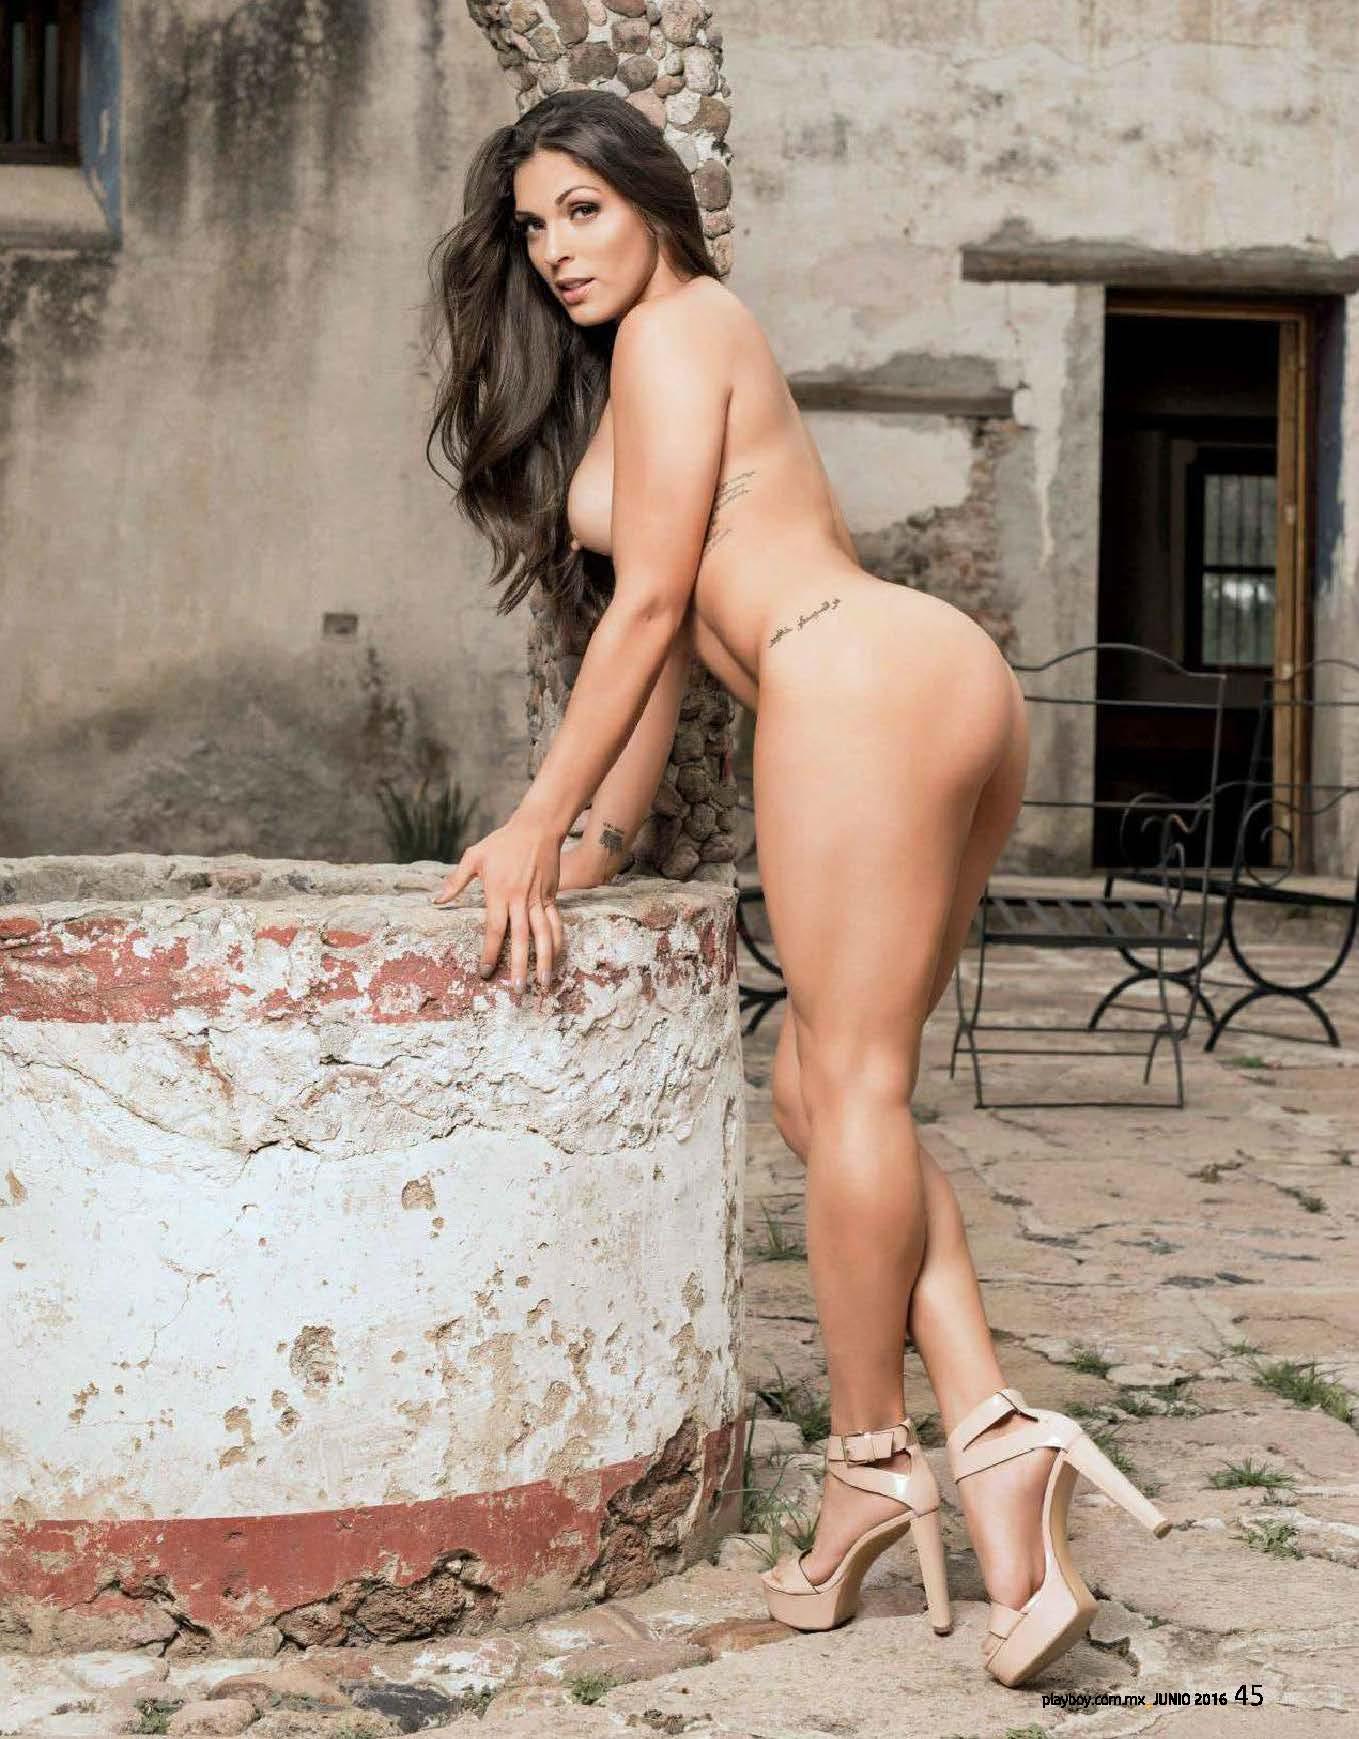 woman-jenney-rivera-naked